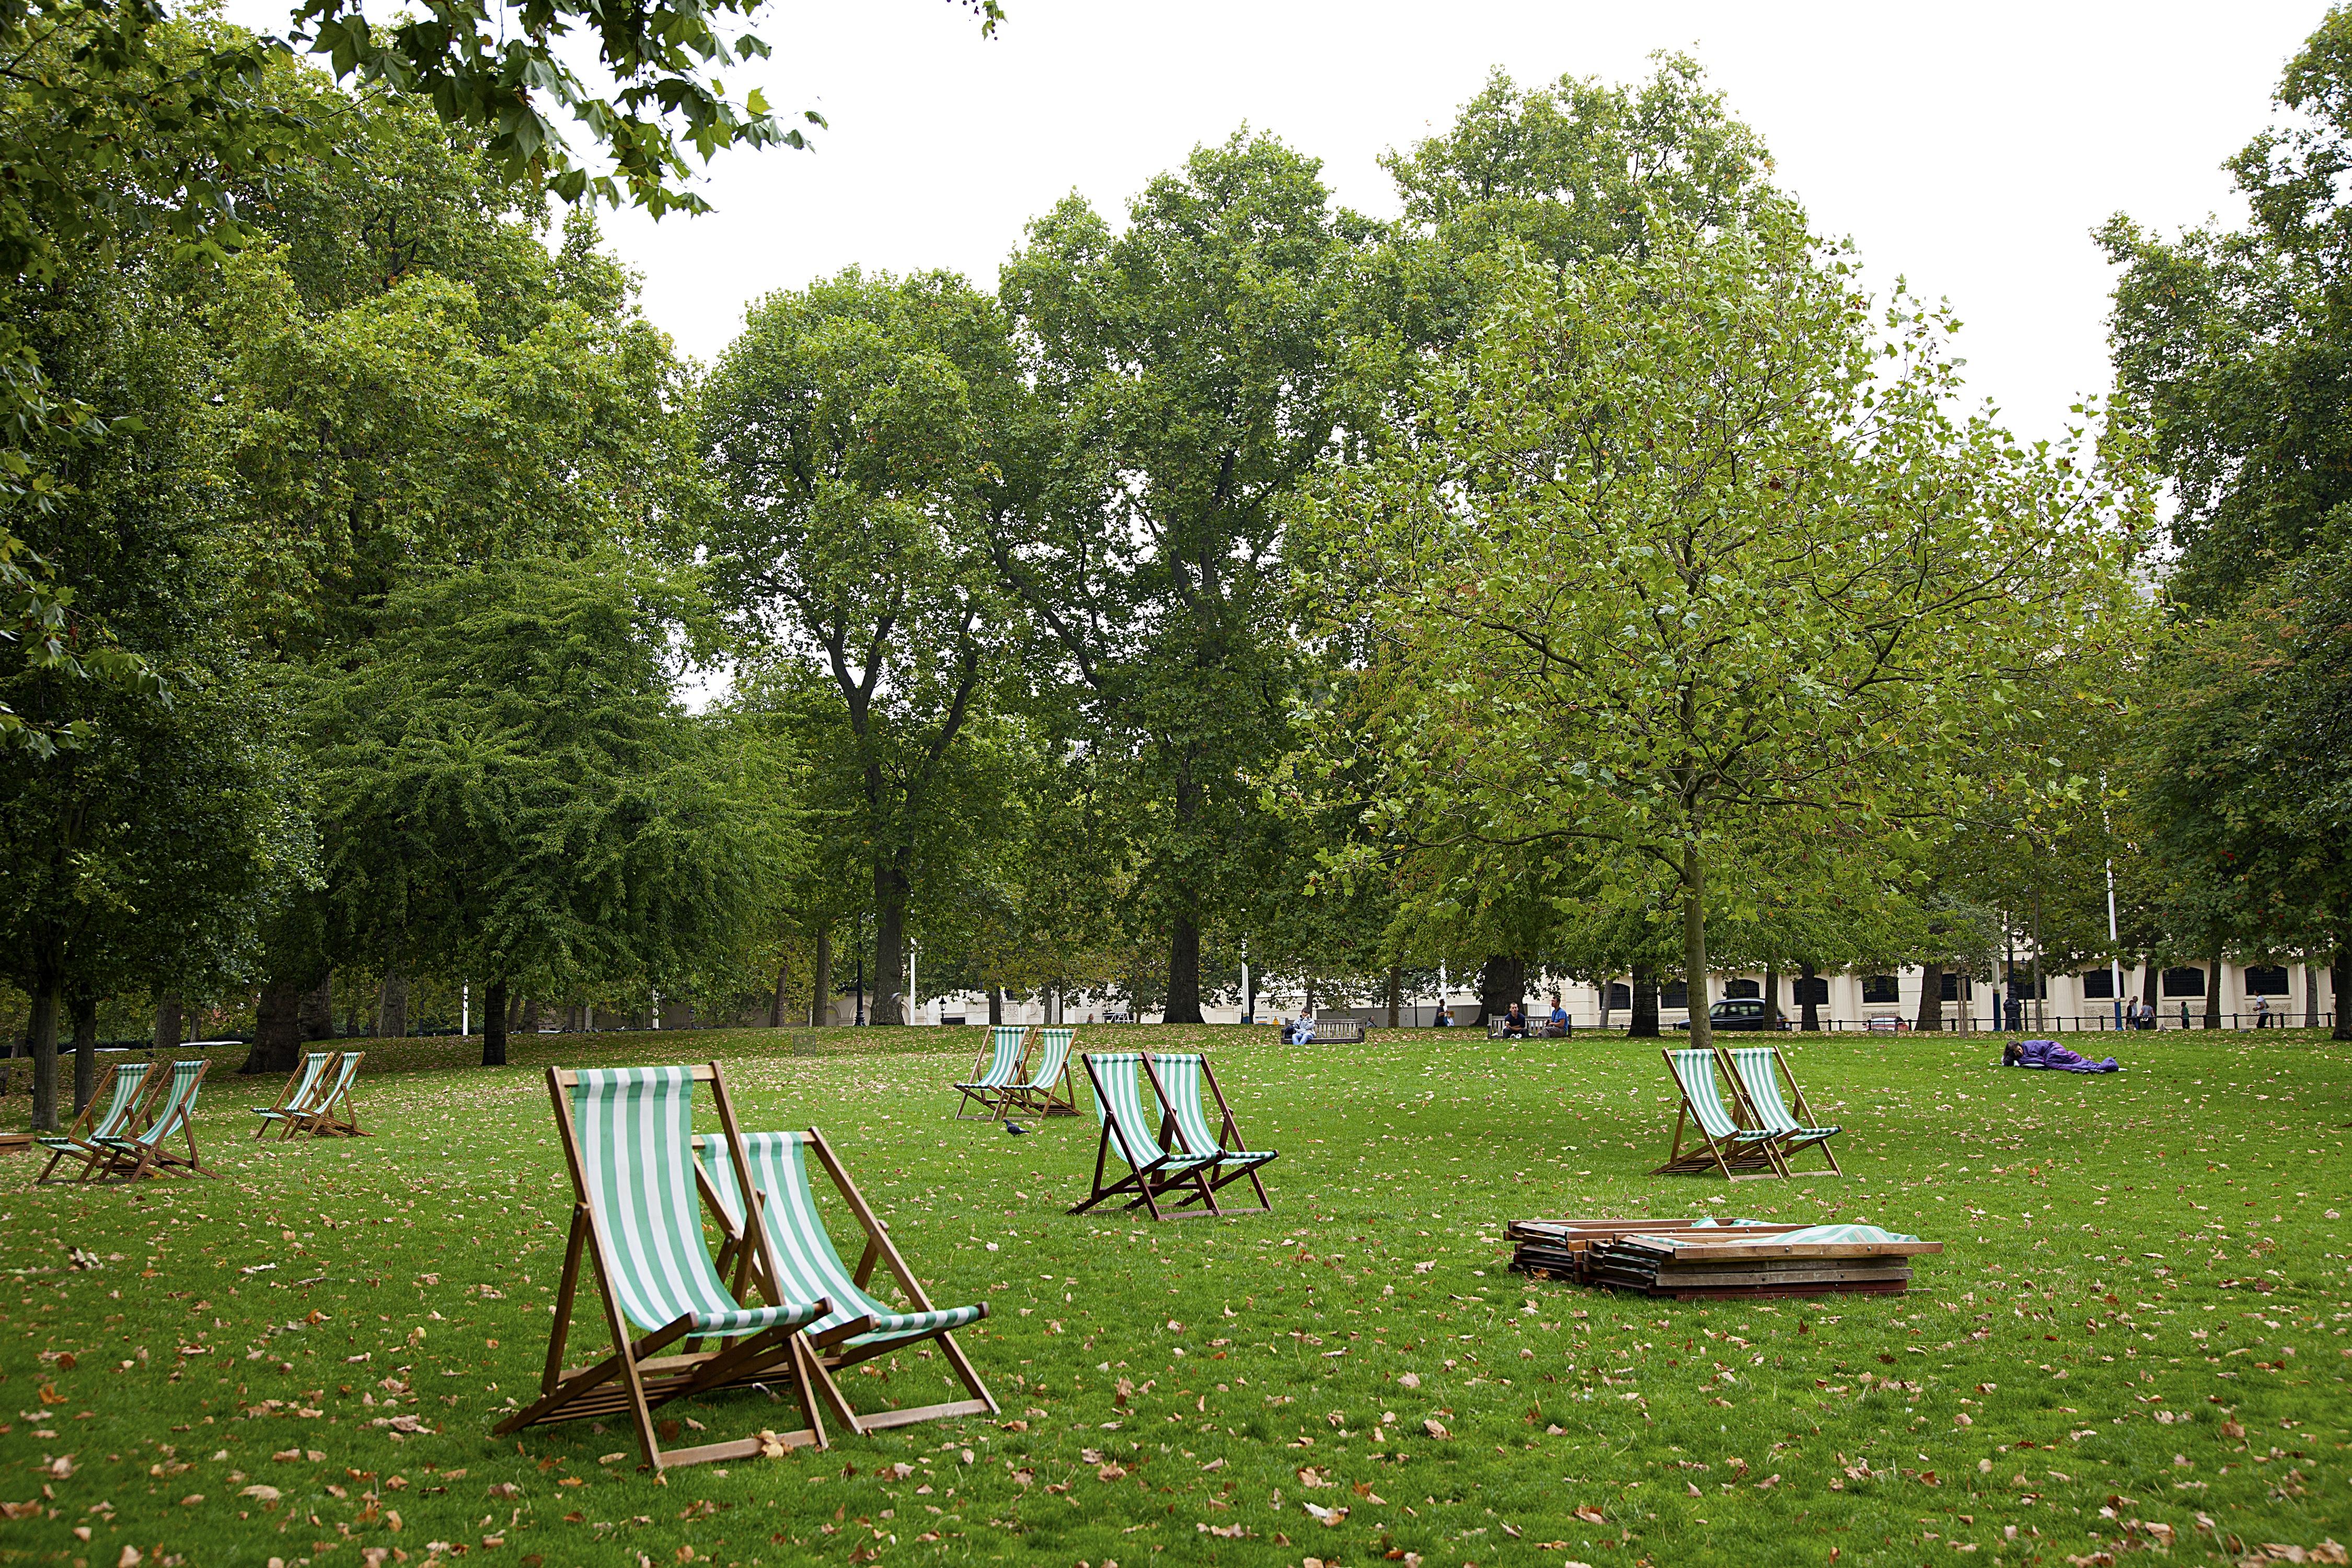 Free grass lawn meadow chair green park backyard